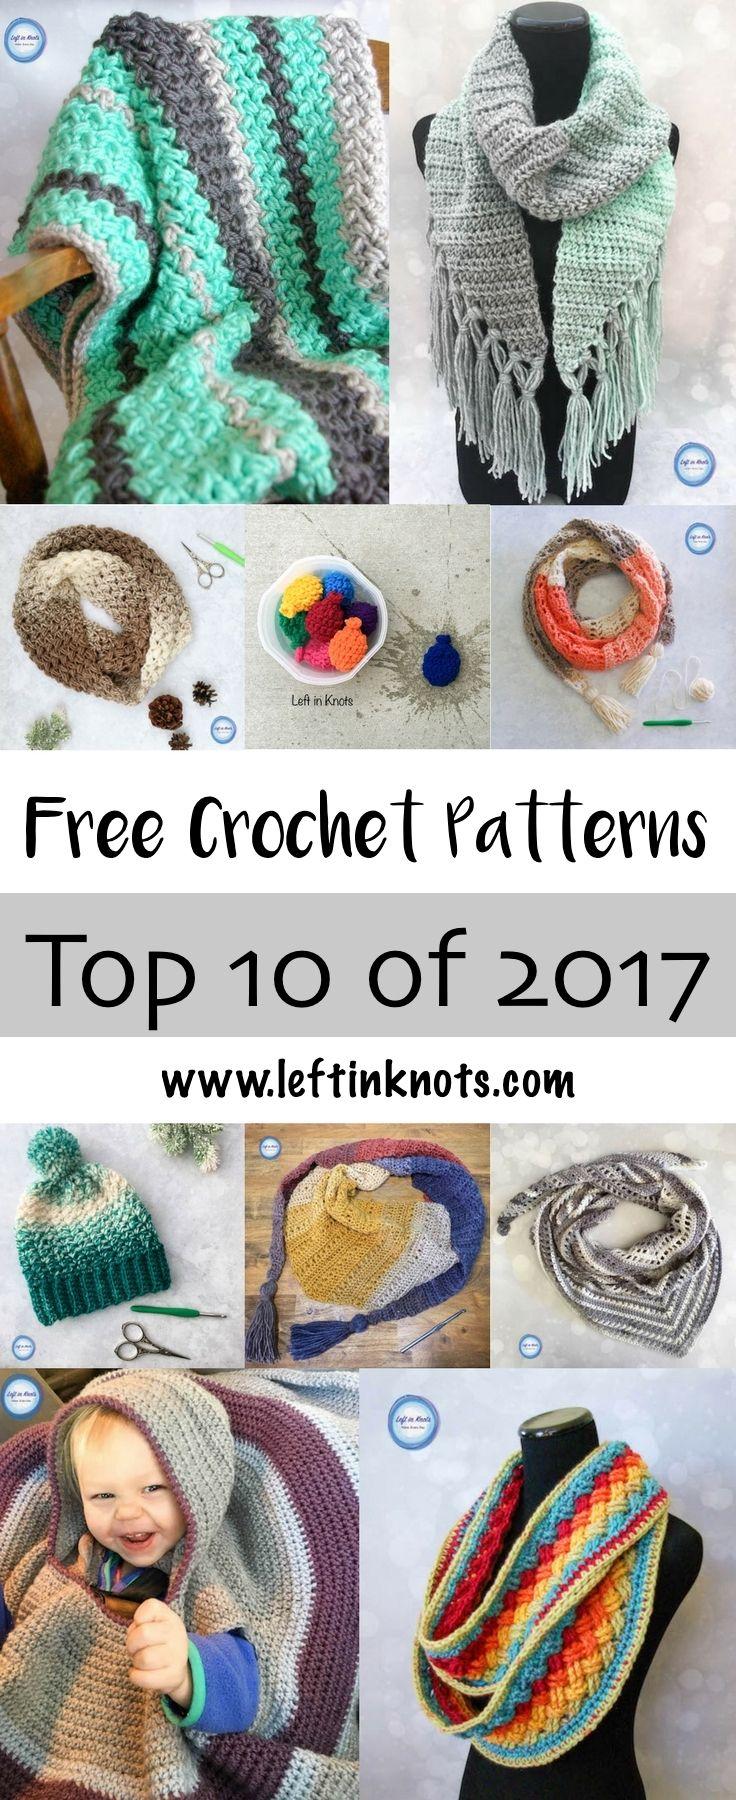 Top 10 Free Crochet Patterns of 2017 | Pinterest | Patrones blusas ...